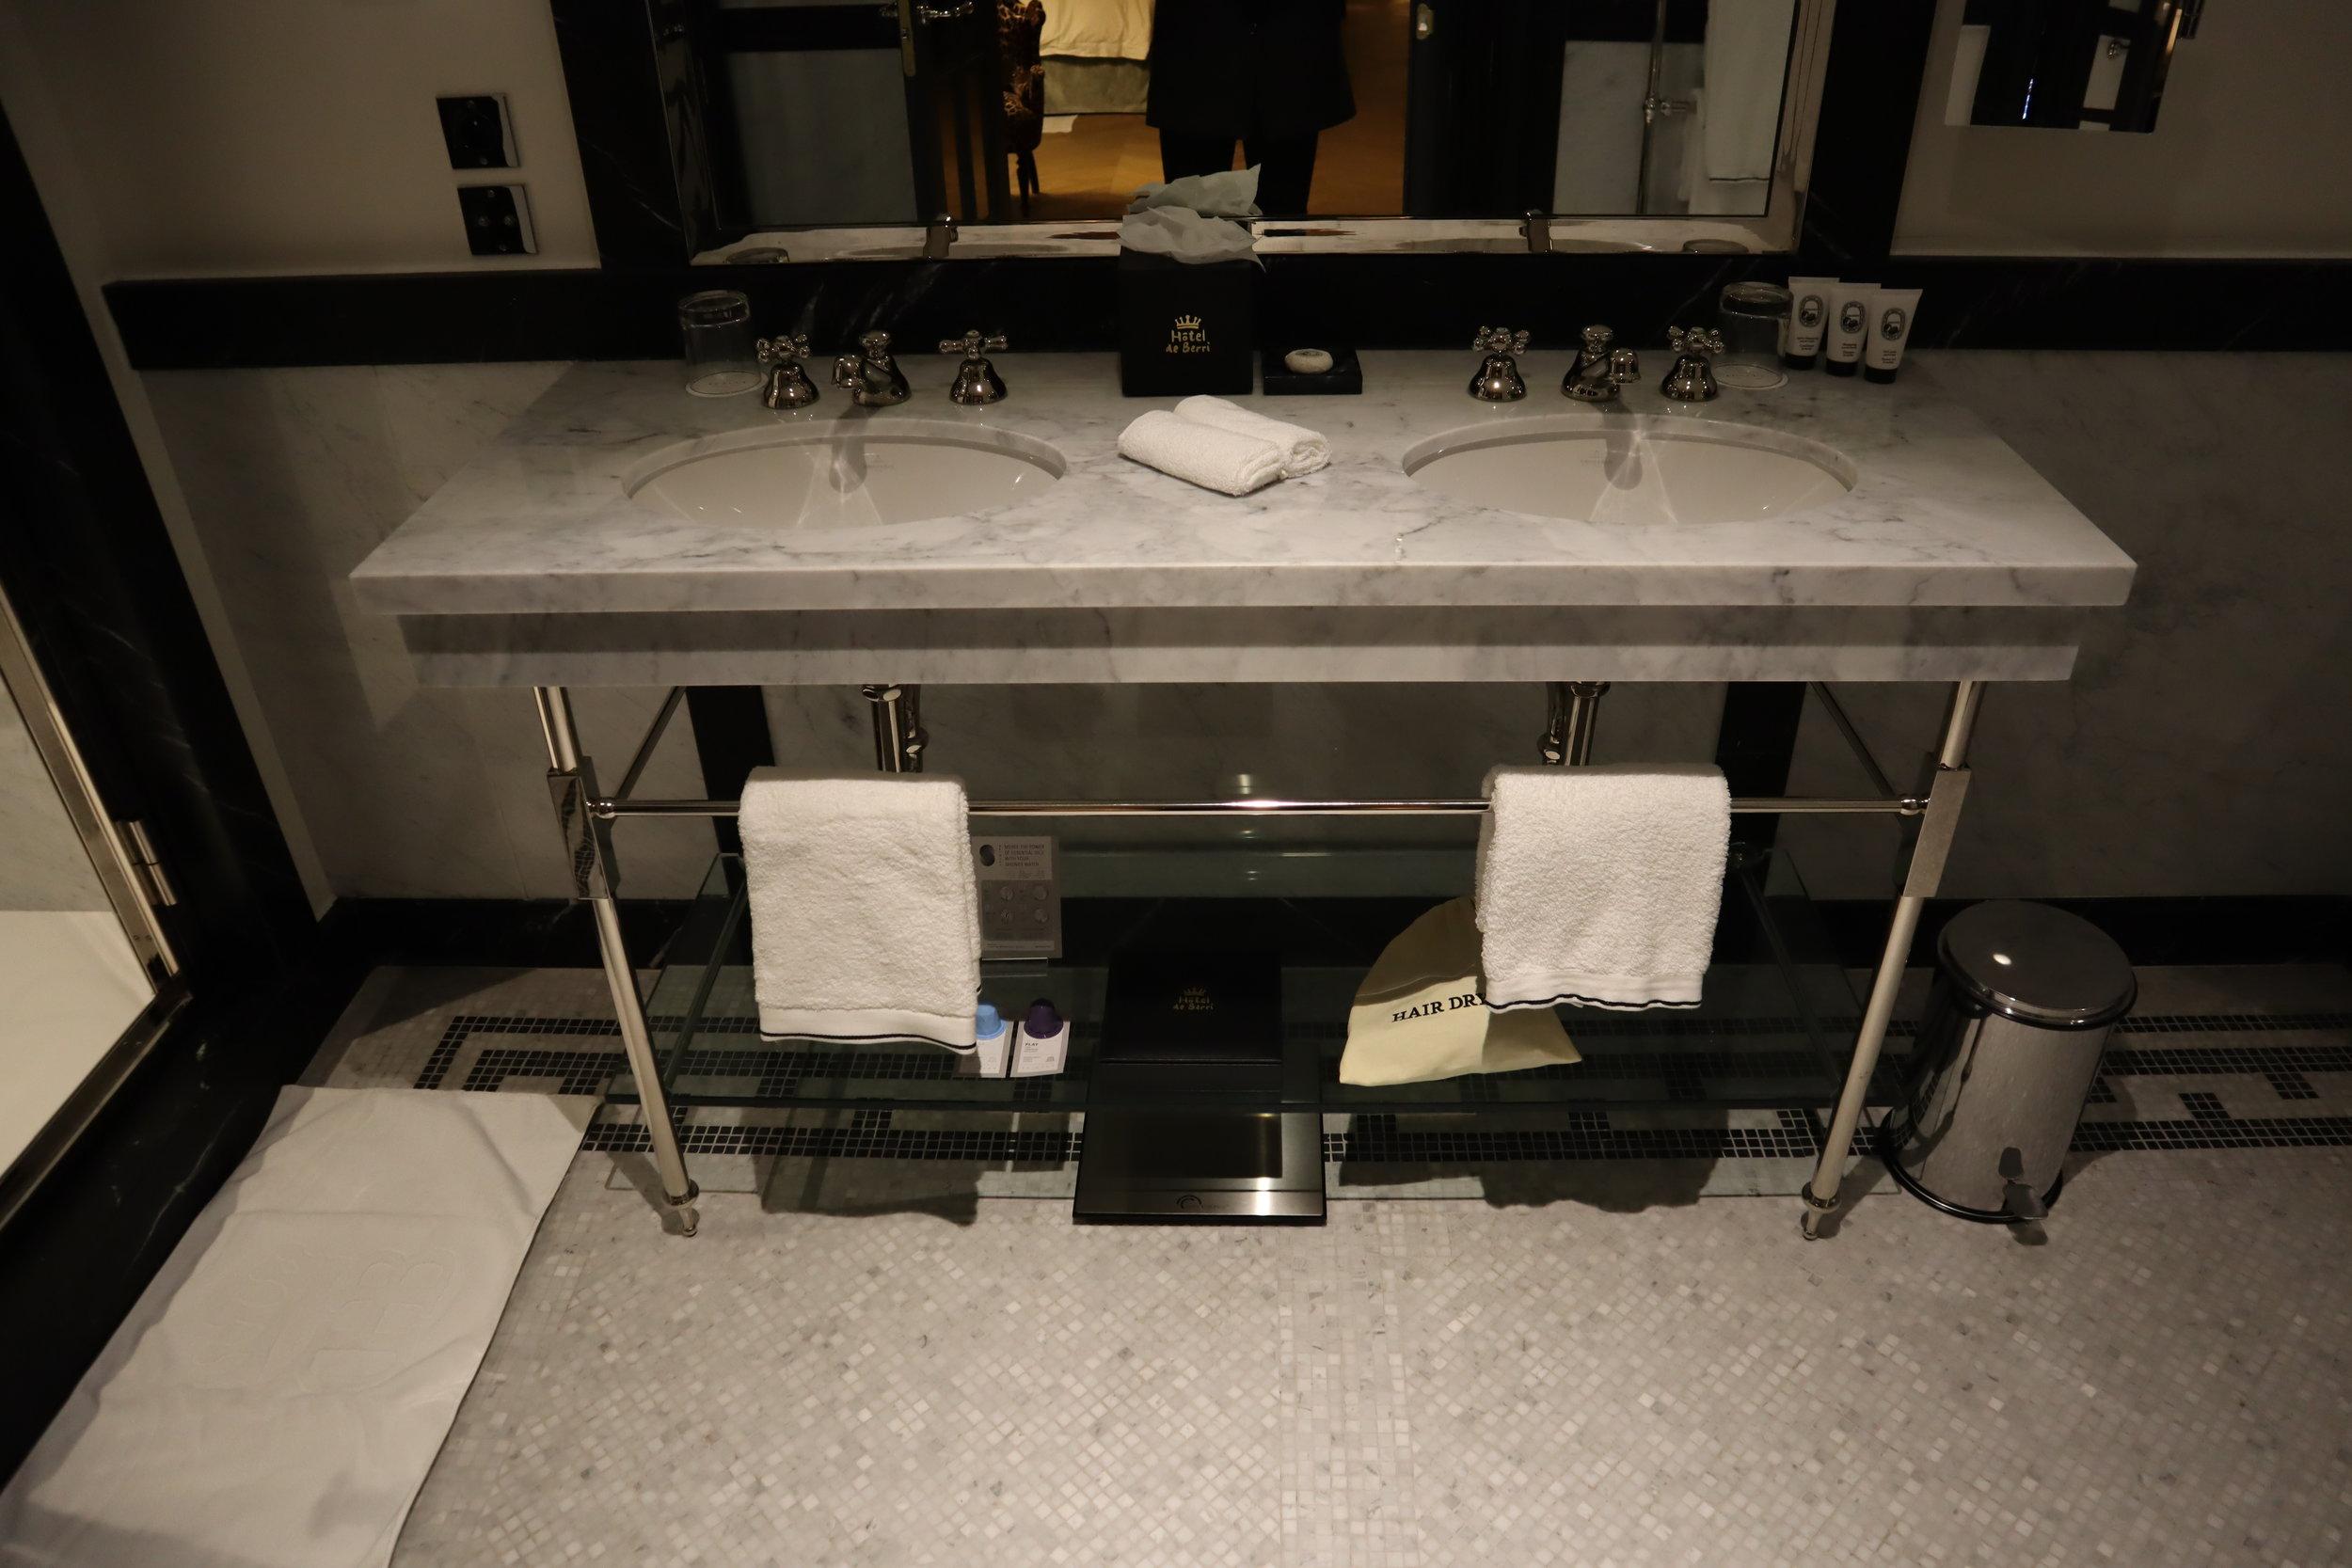 Hôtel de Berri Paris – Berri Suite sink and mirror